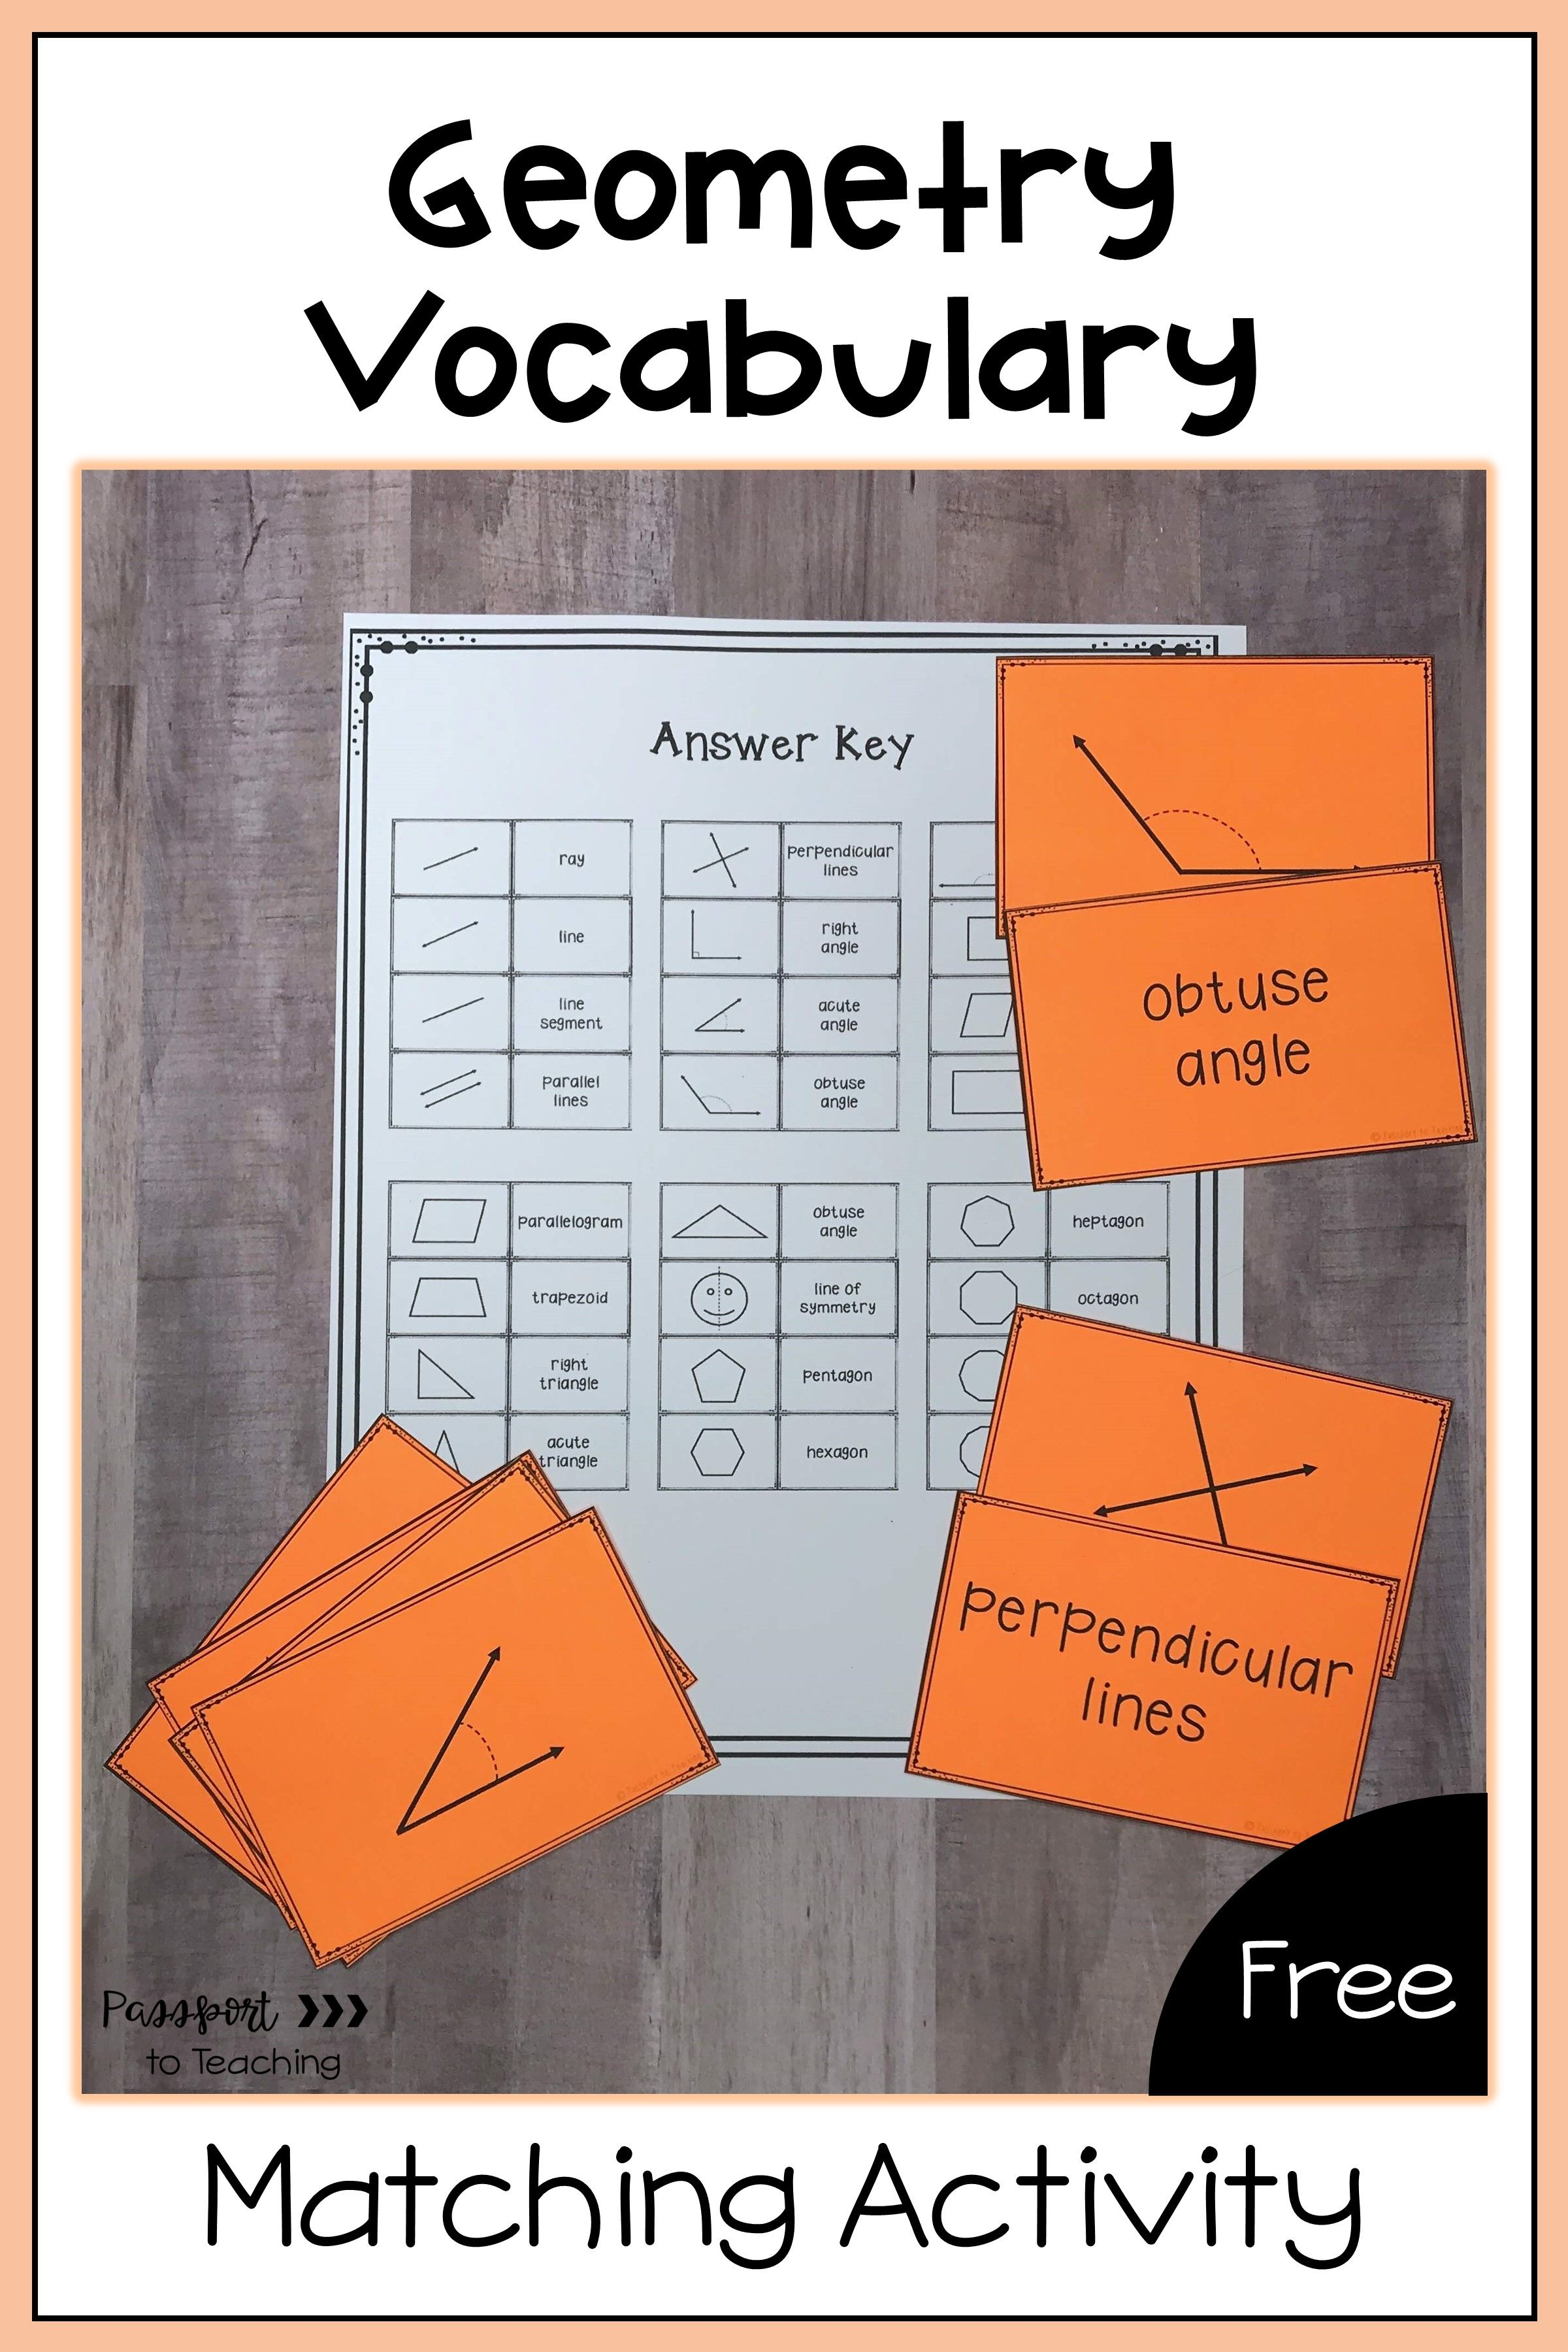 Geometry Vocabulary Matching Activity